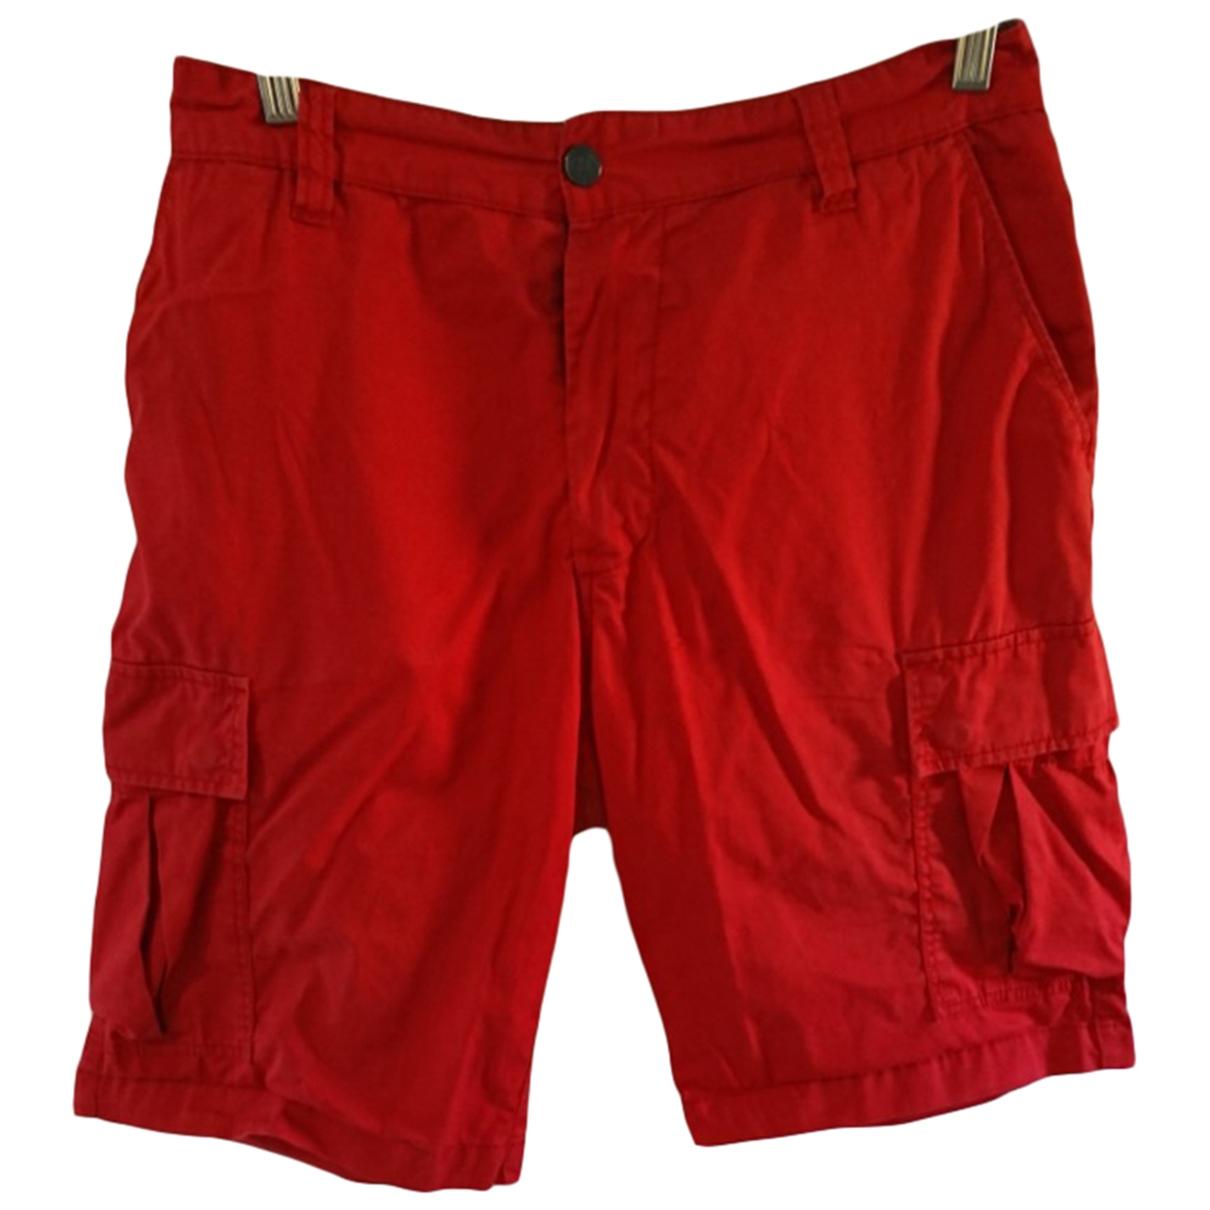 Emporio Armani \N Red Cotton Shorts for Men L International